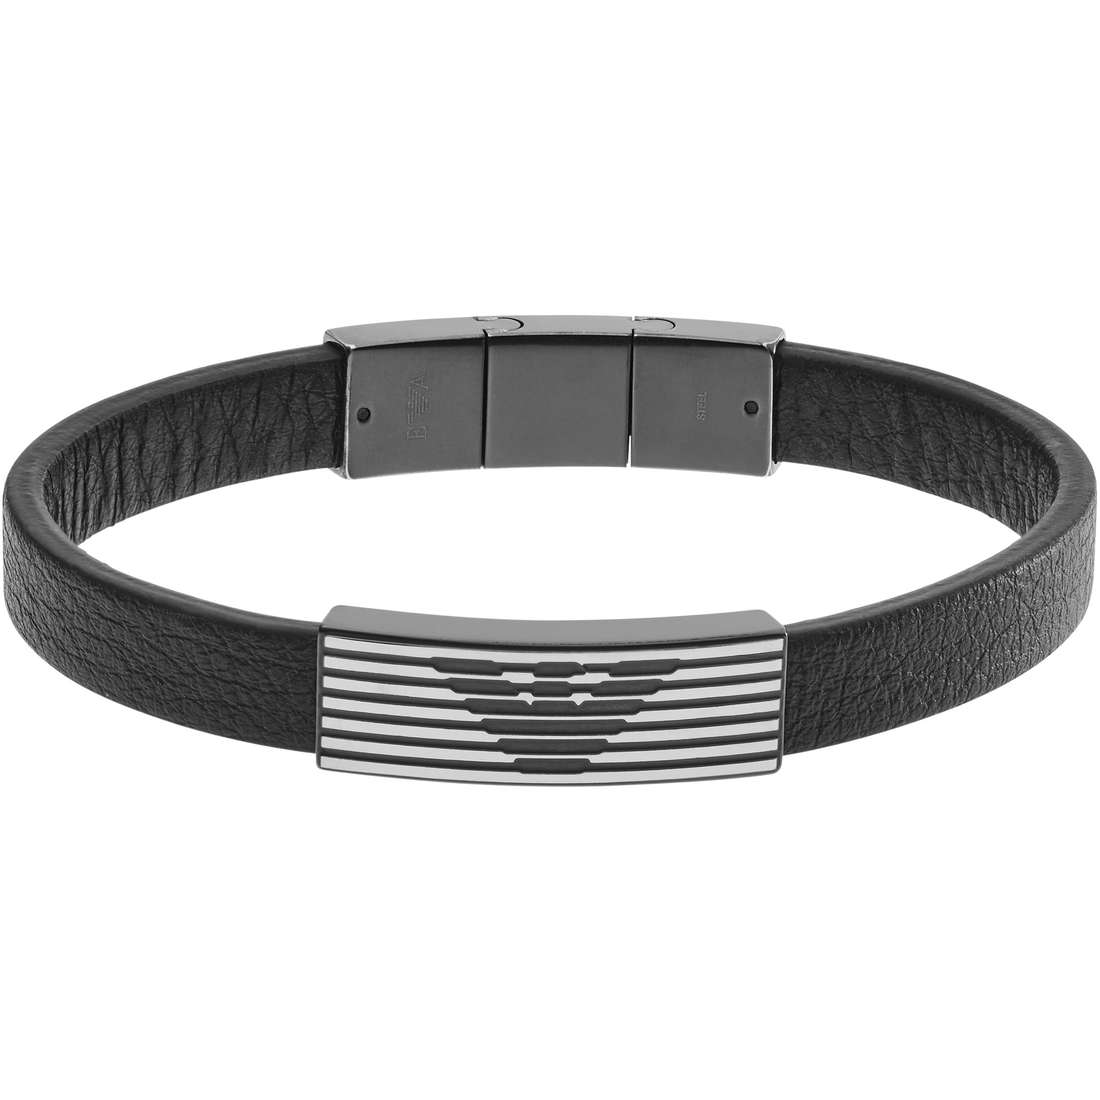 bracelet man jewellery Emporio Armani Signature EGS2181060